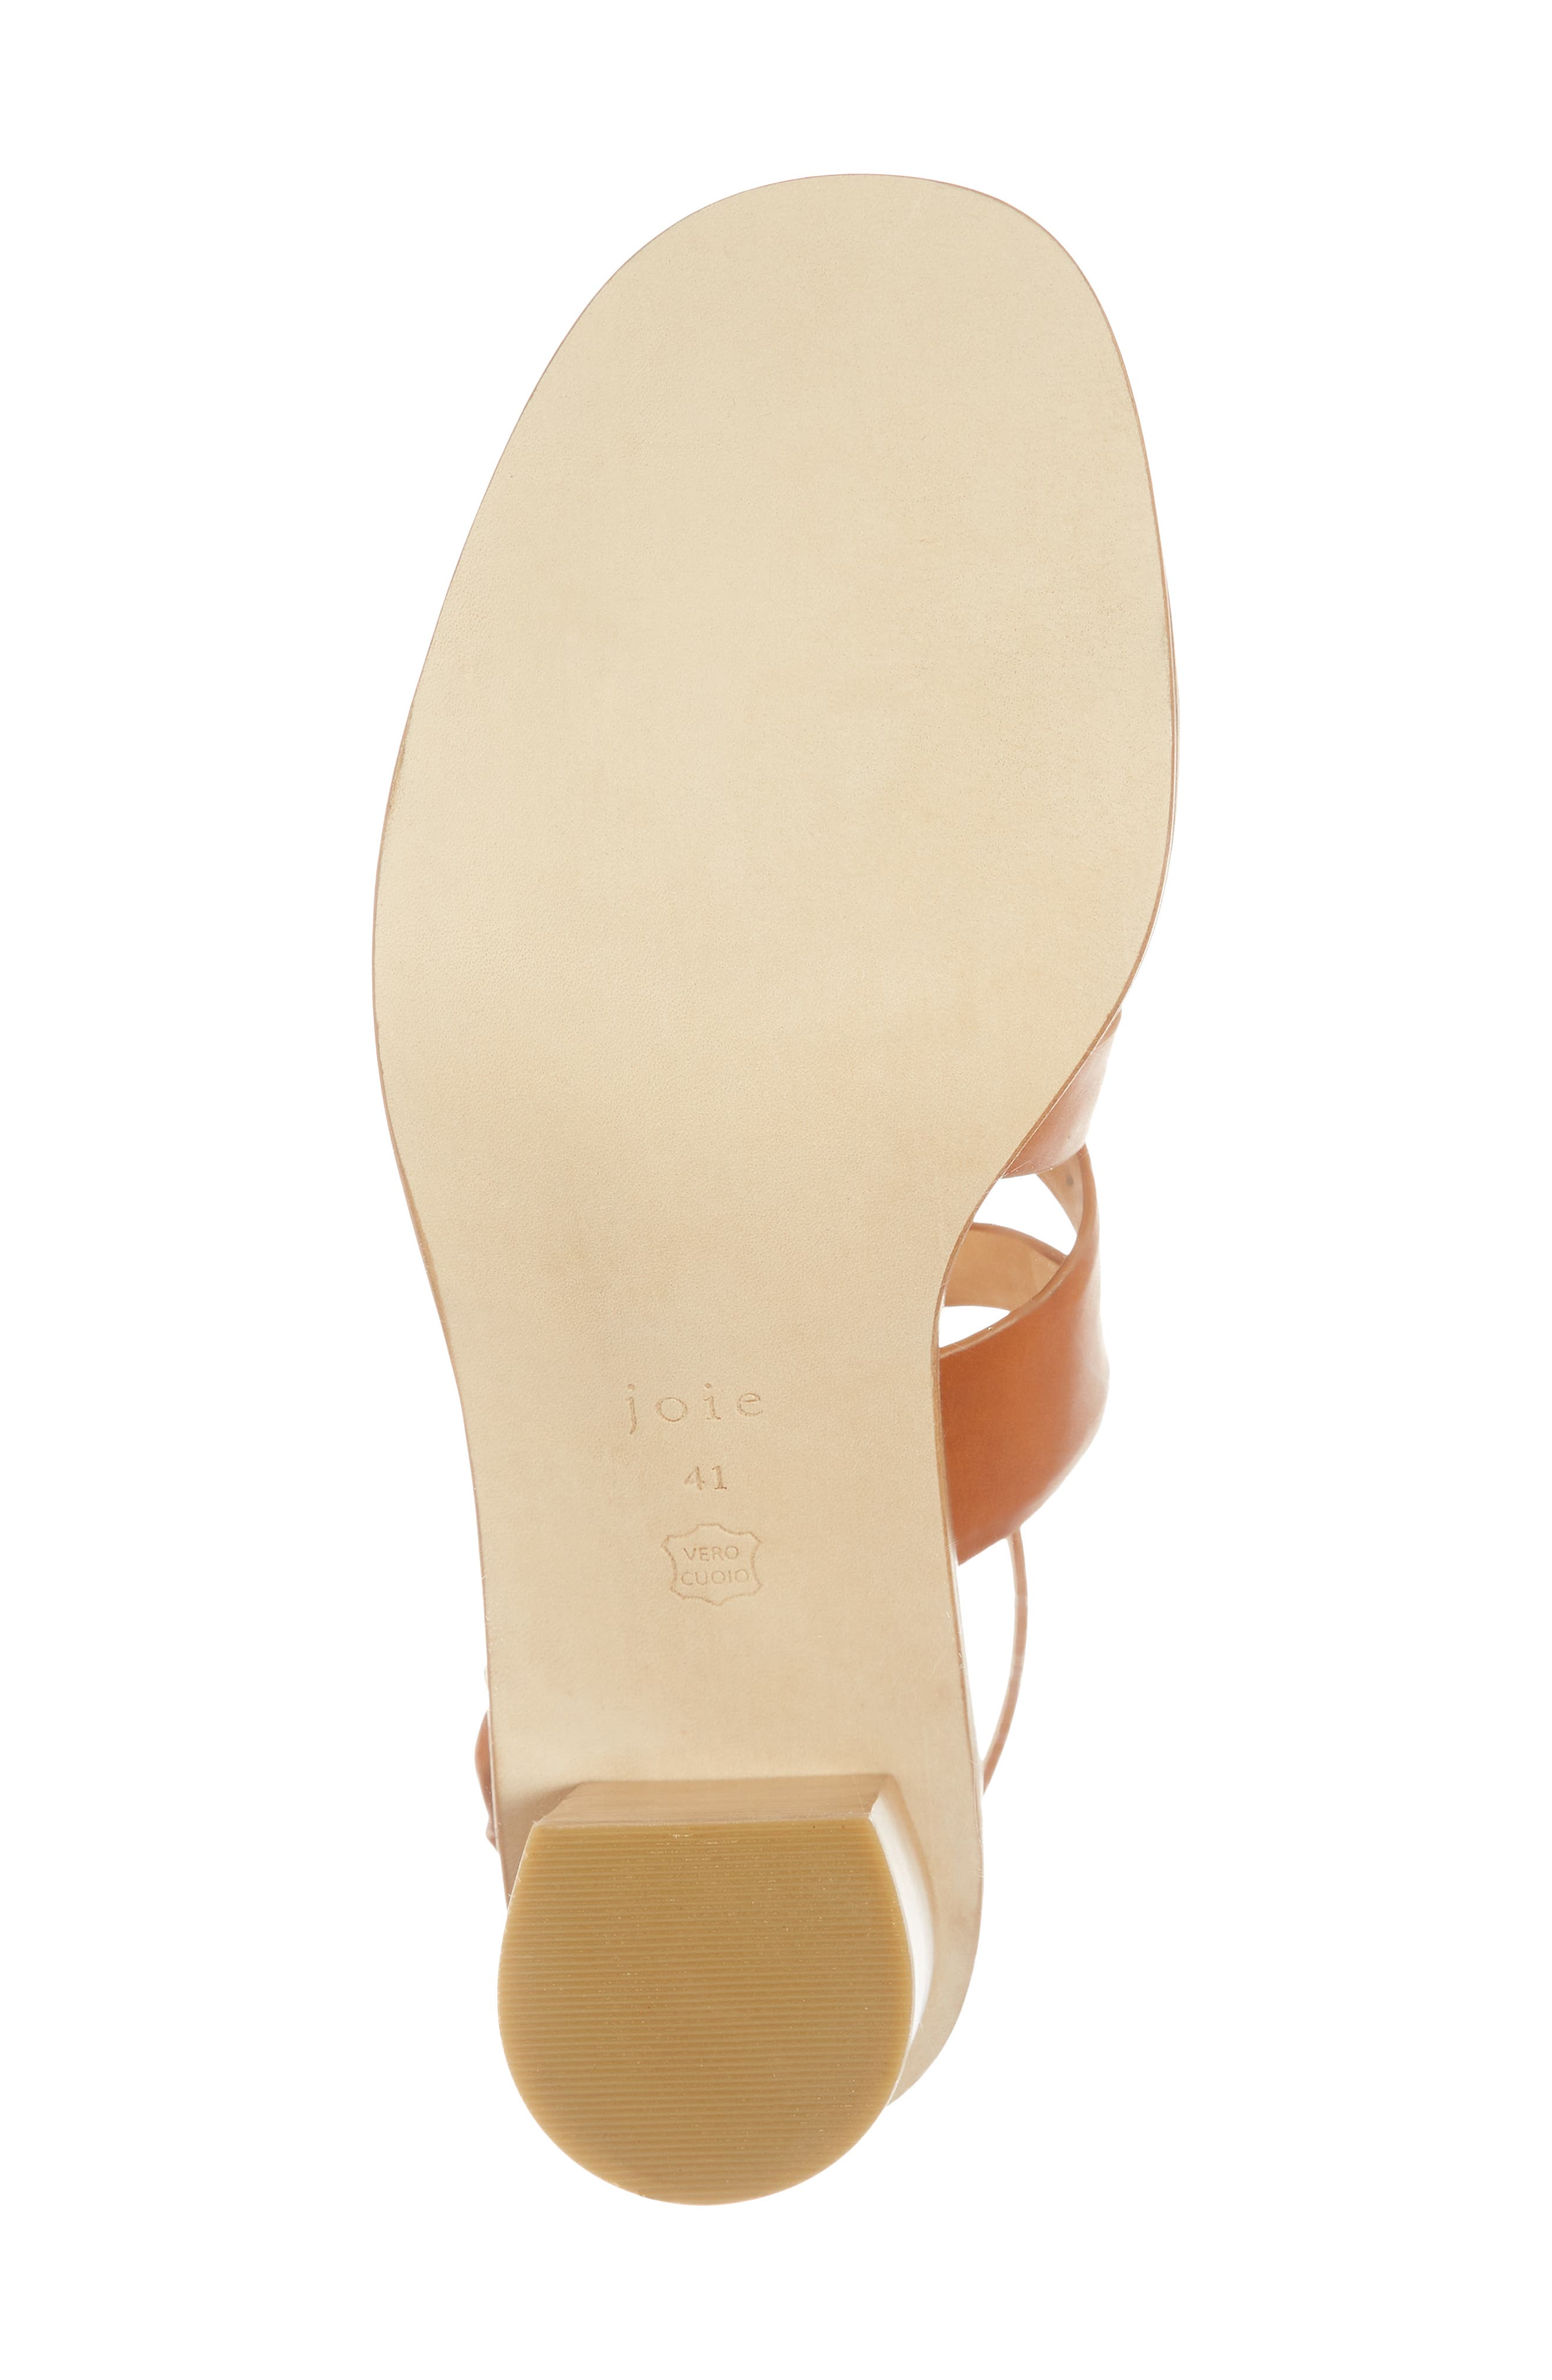 Onfer Studded Strappy Sandal,                             Alternate thumbnail 6, color,                             Tan